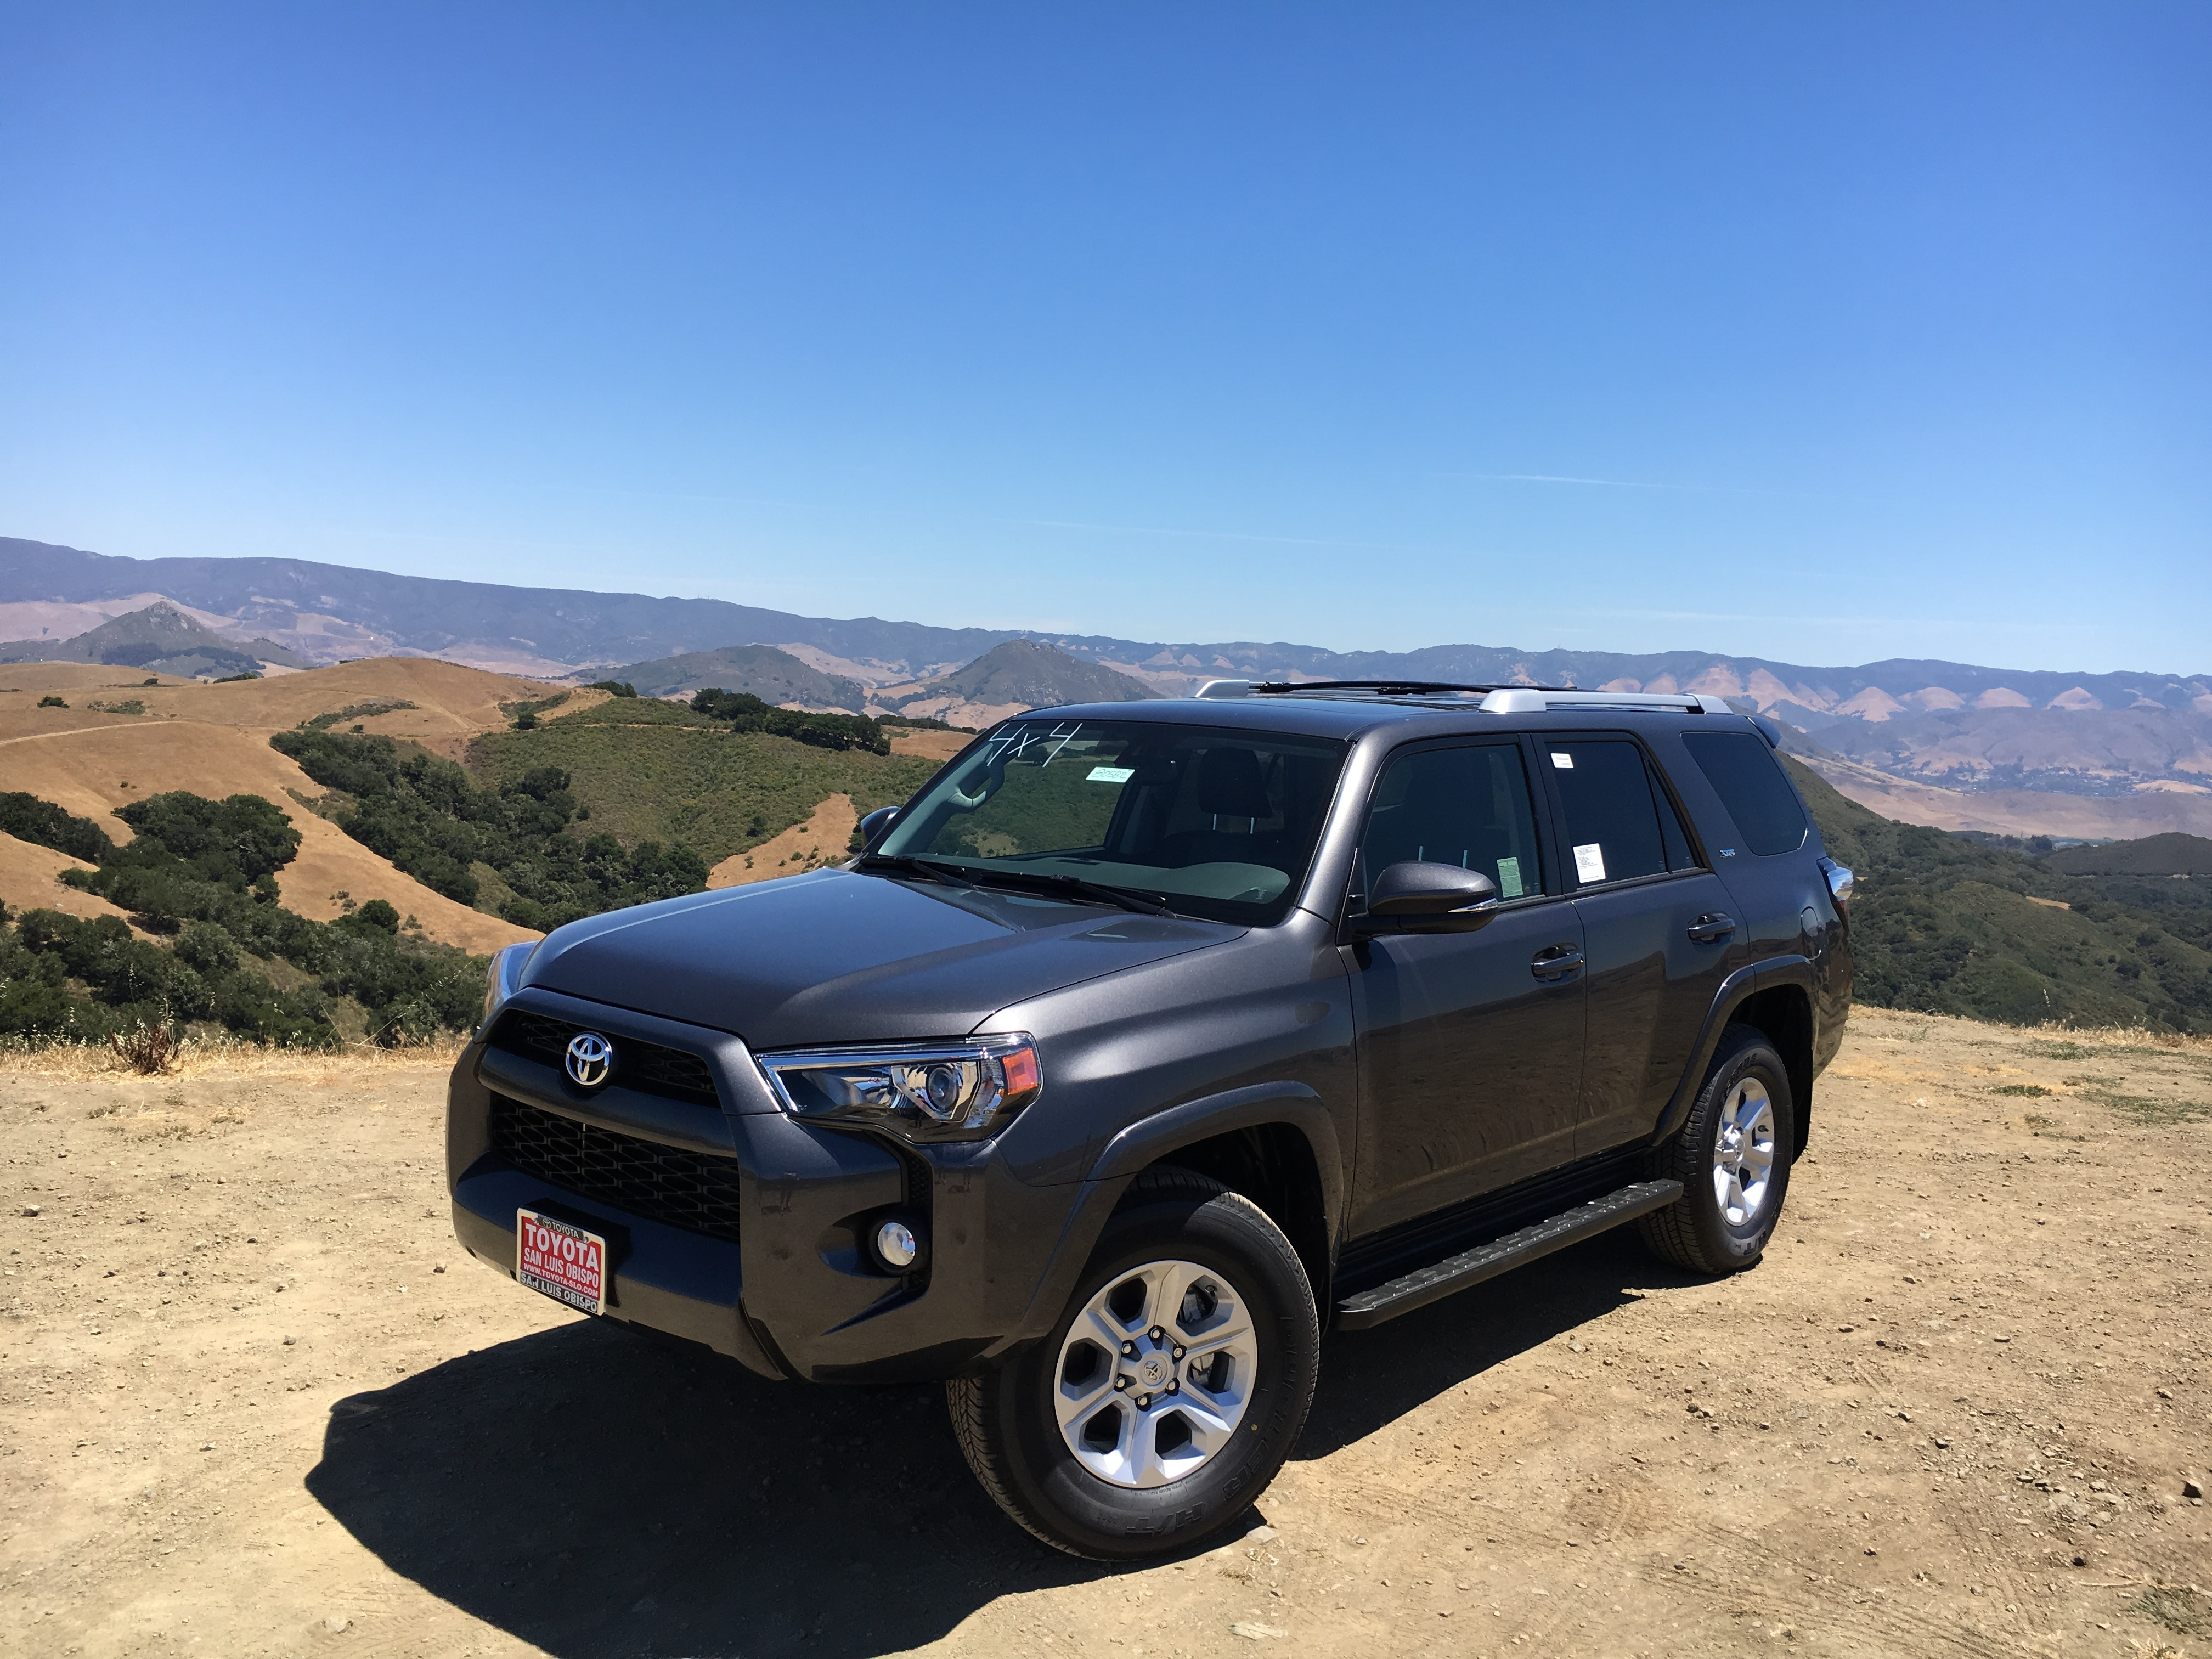 Toyota San Luis Obispo | Best Local Places to Take Your Toyota this ...